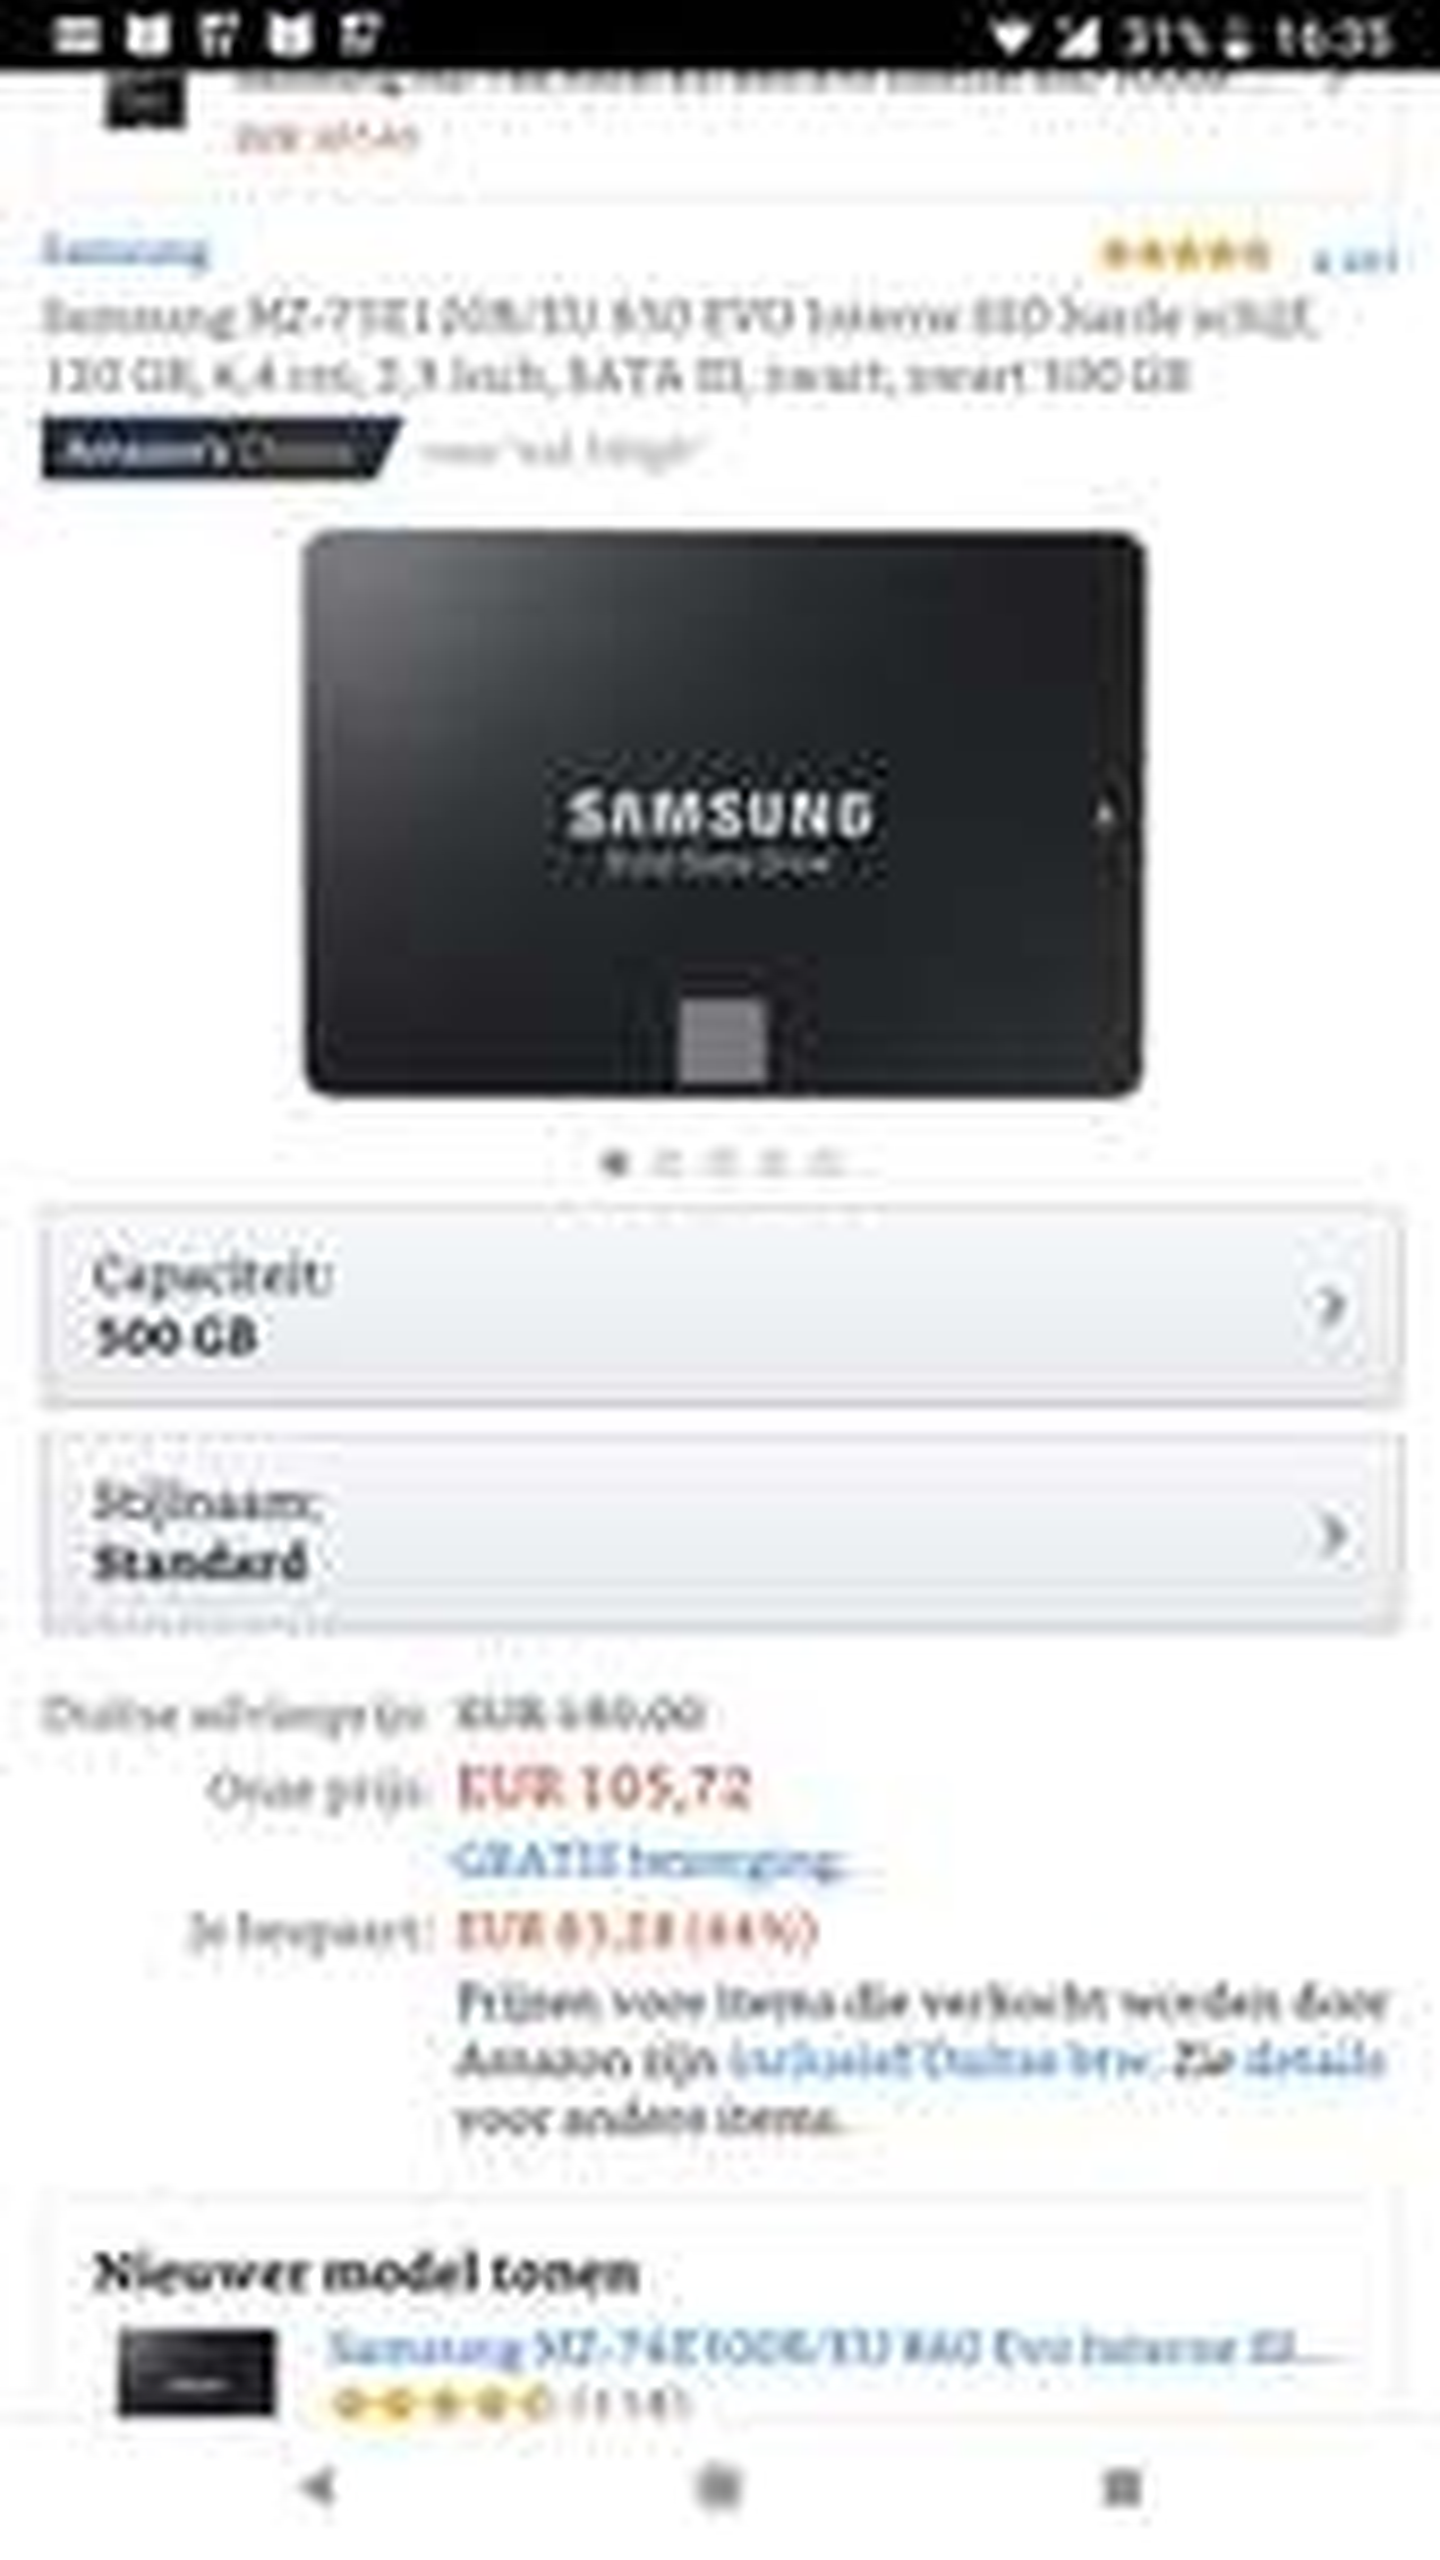 Samsung evo 850 ssd 500gb